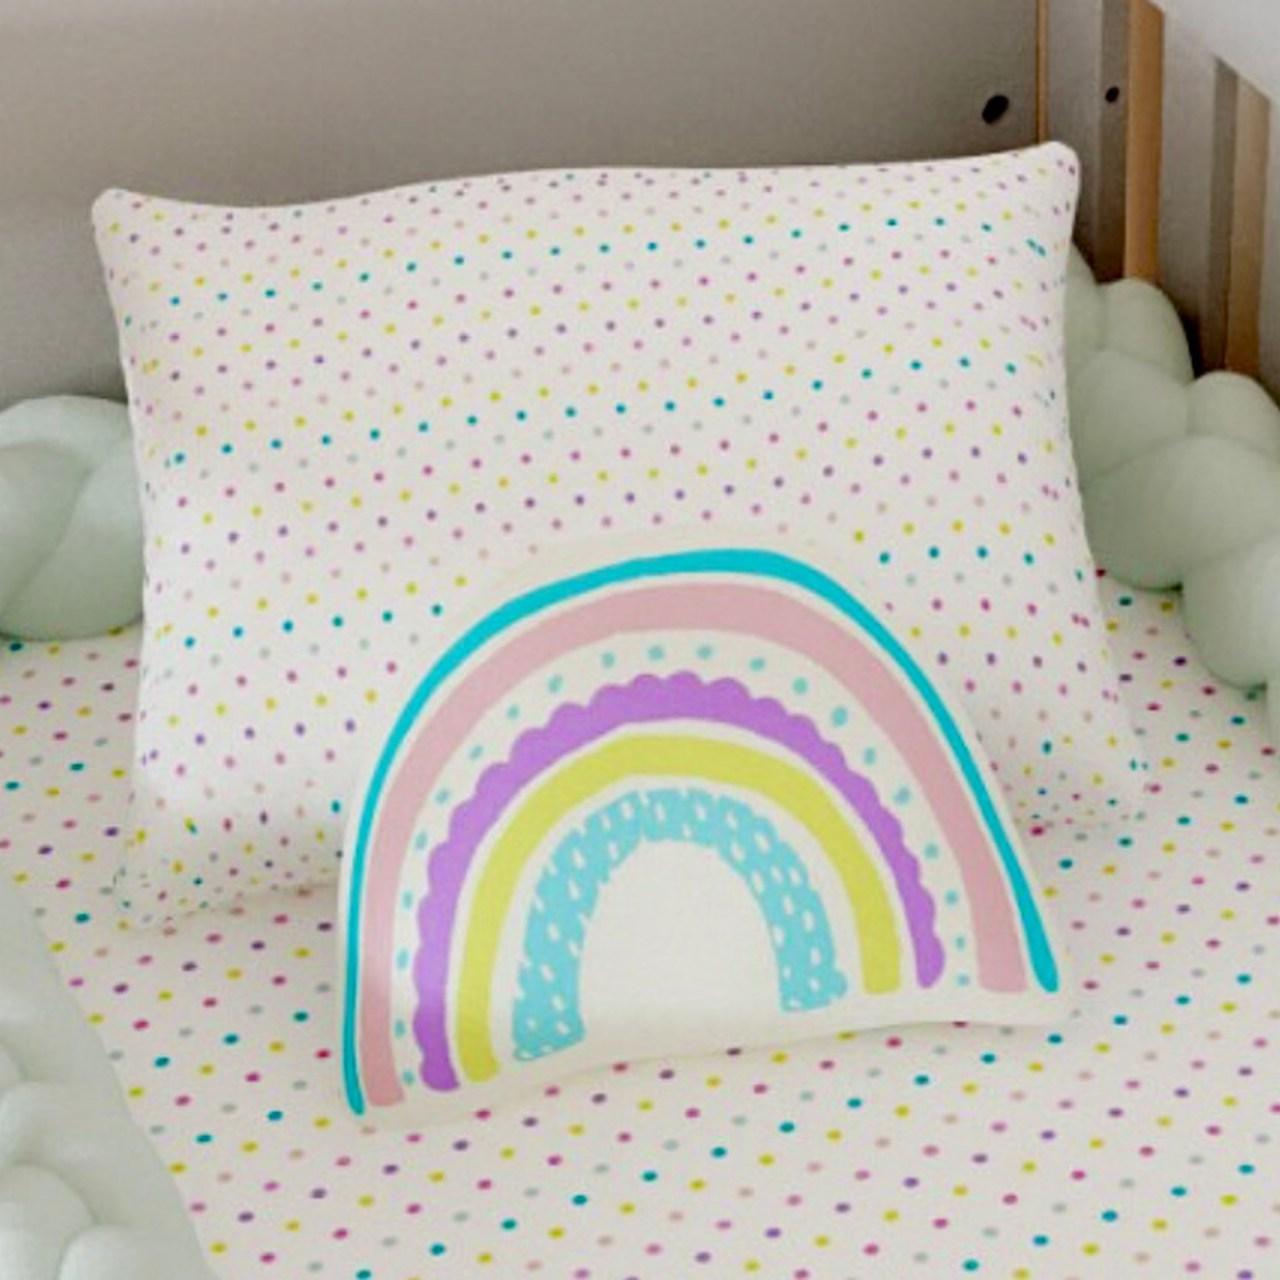 Almofada infantil toy arco íris candy :)